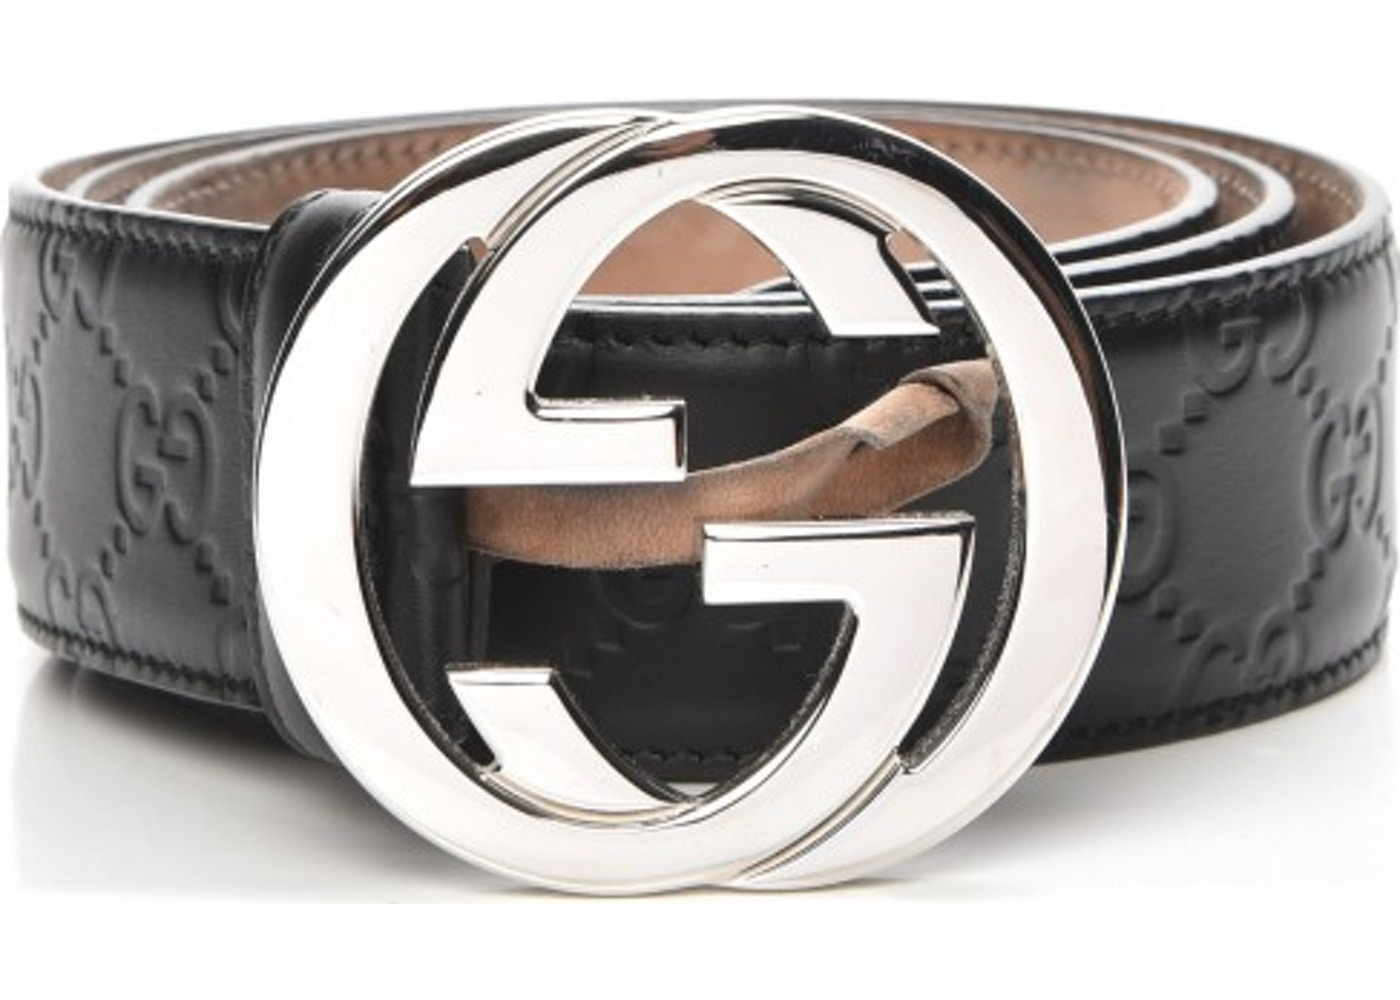 e91199d9941 Gucci Interlocking G Belt Monogram Guccissima Black. Monogram Guccissima  Black